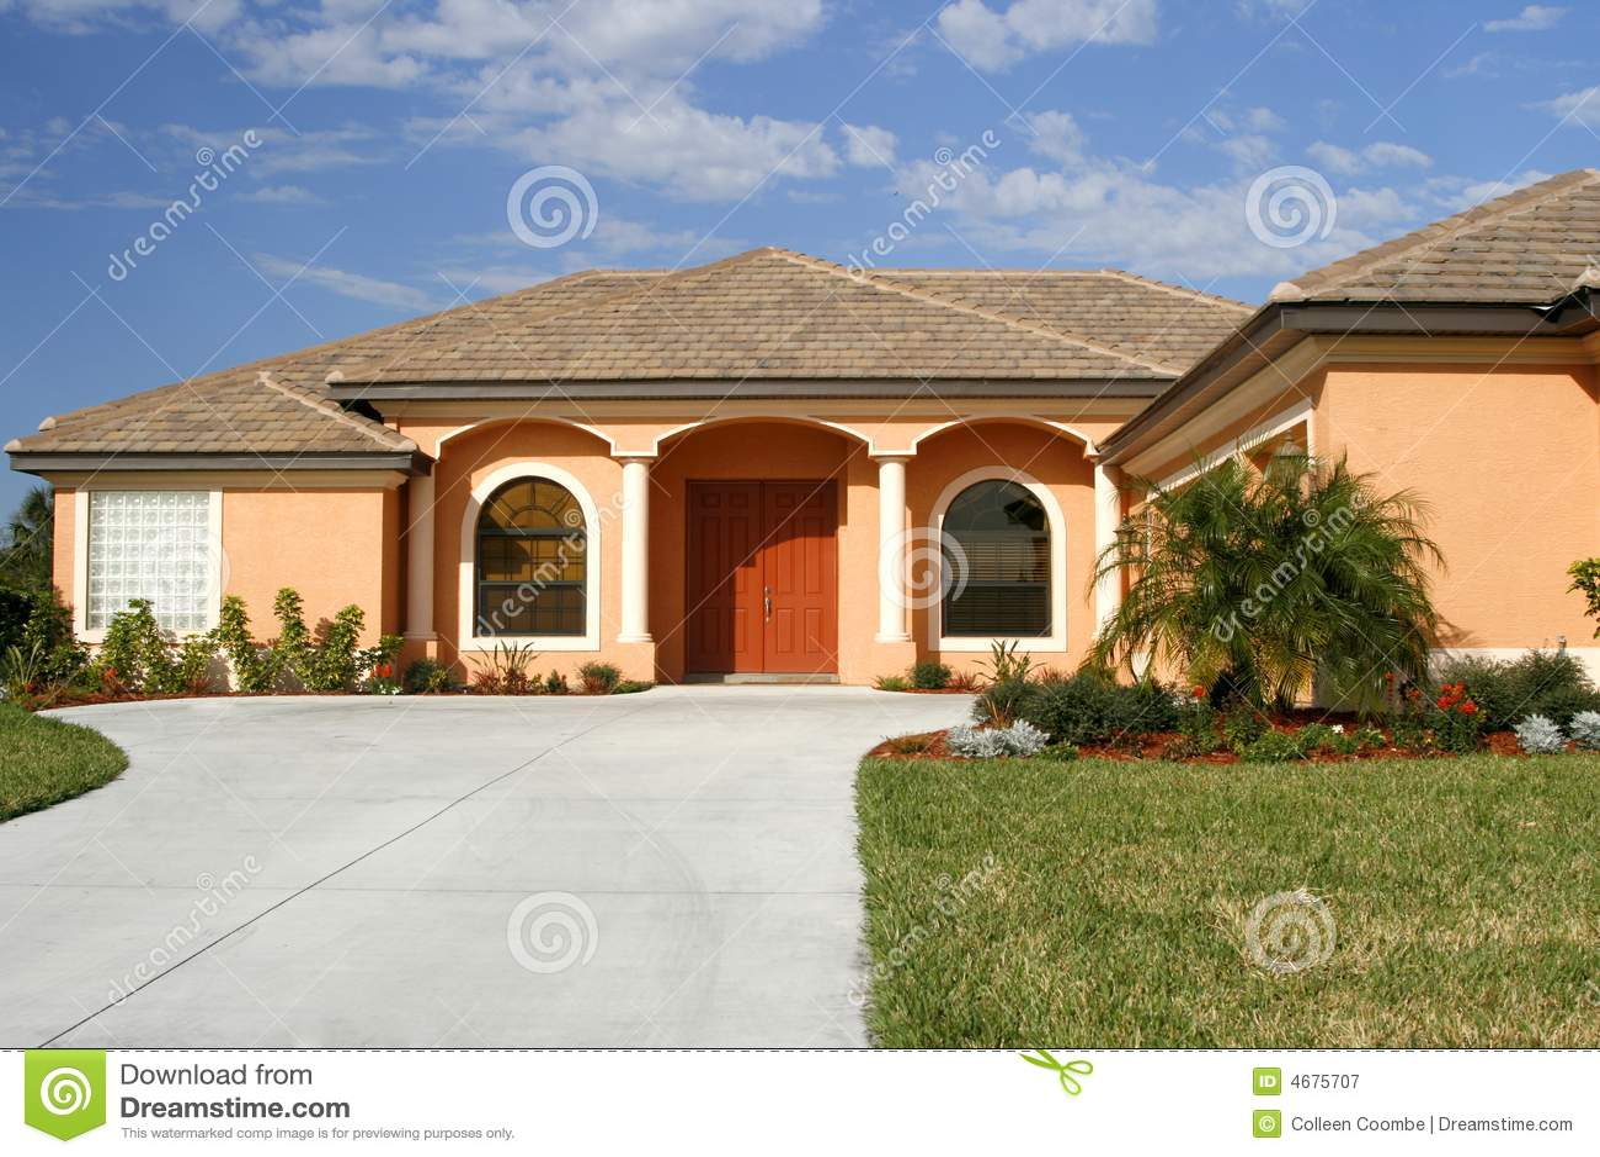 Enchanting home new